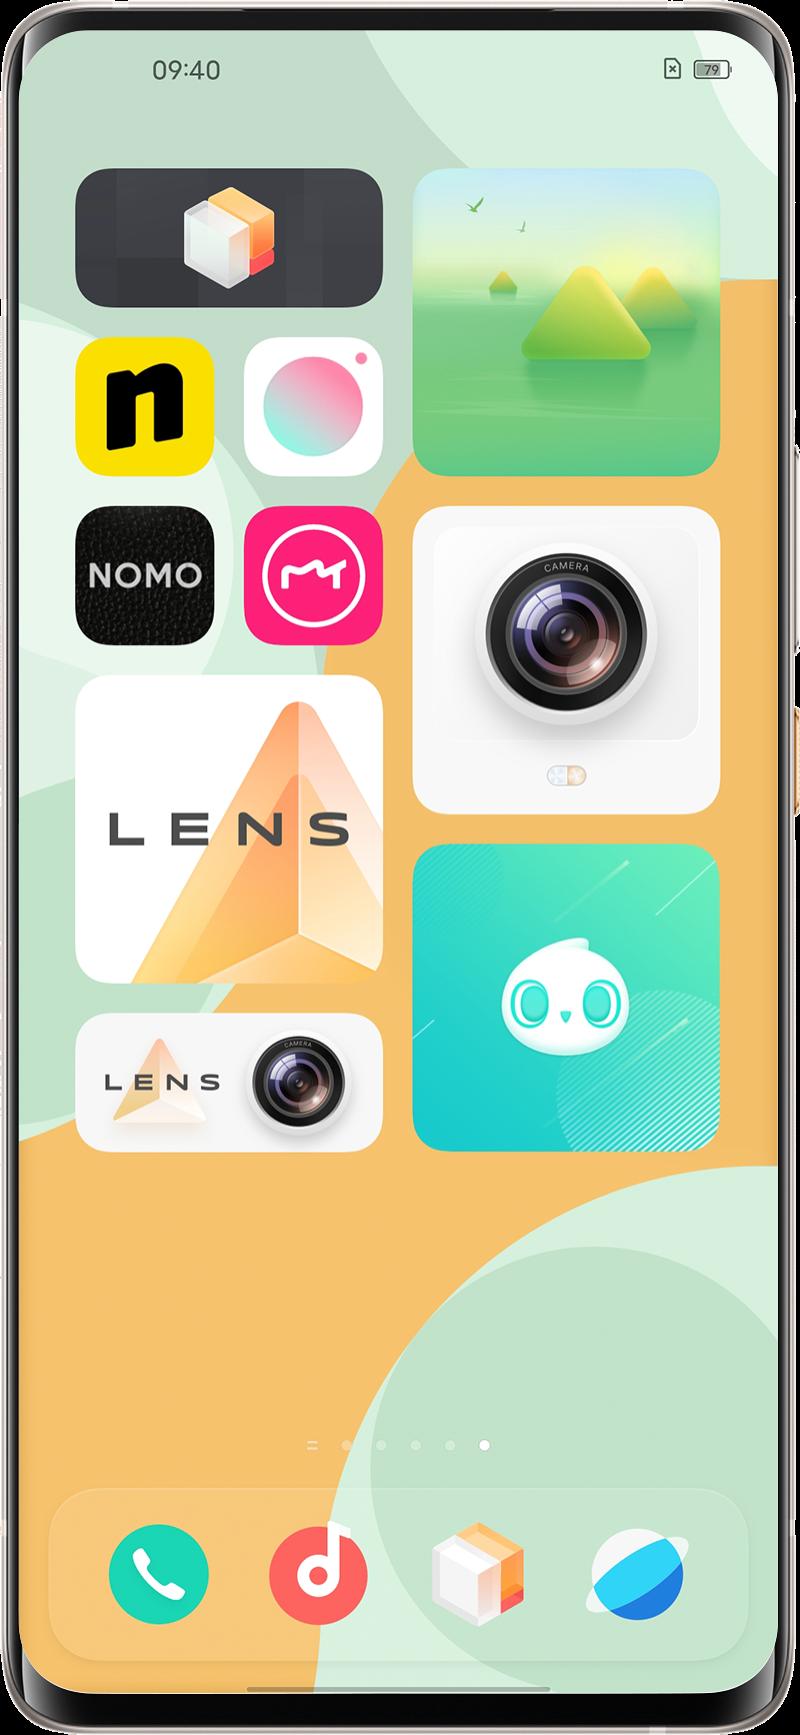 vivo发布OriginOS,带来全新的设计和交互体验 智能公会